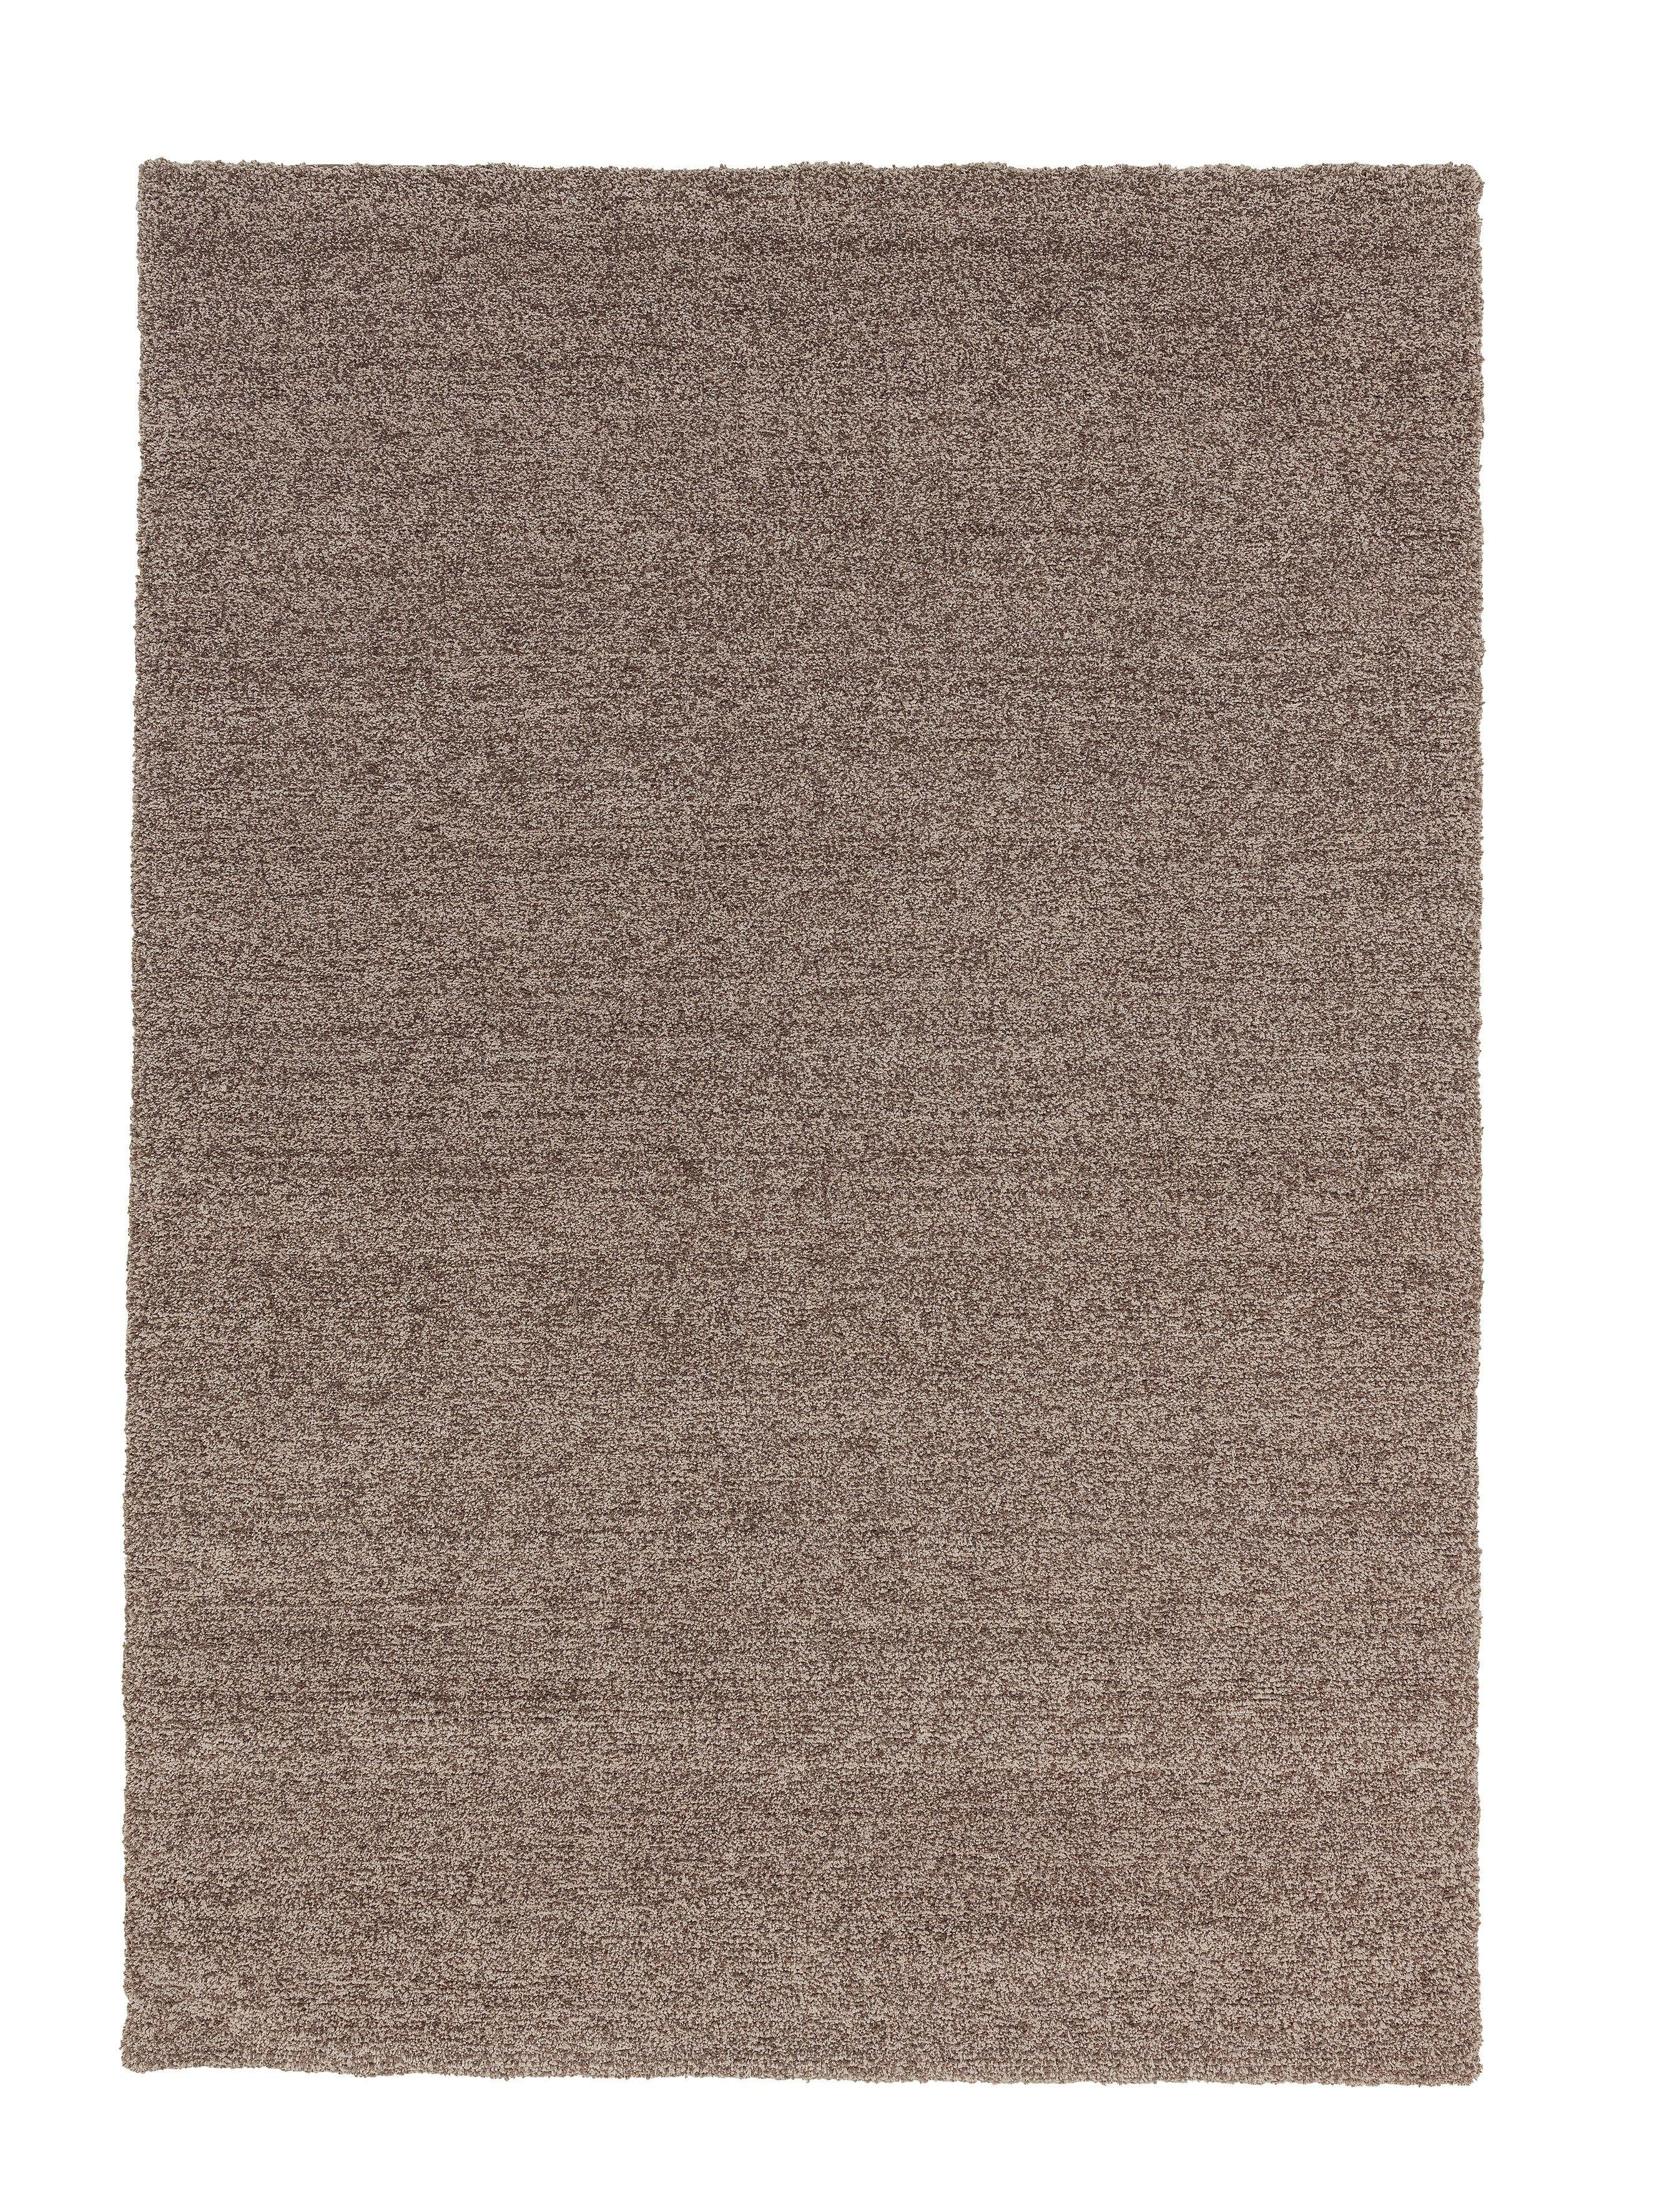 Astra - Golze koberce Kusový koberec Livorno 160062 Mottled Brown - 170x240 cm